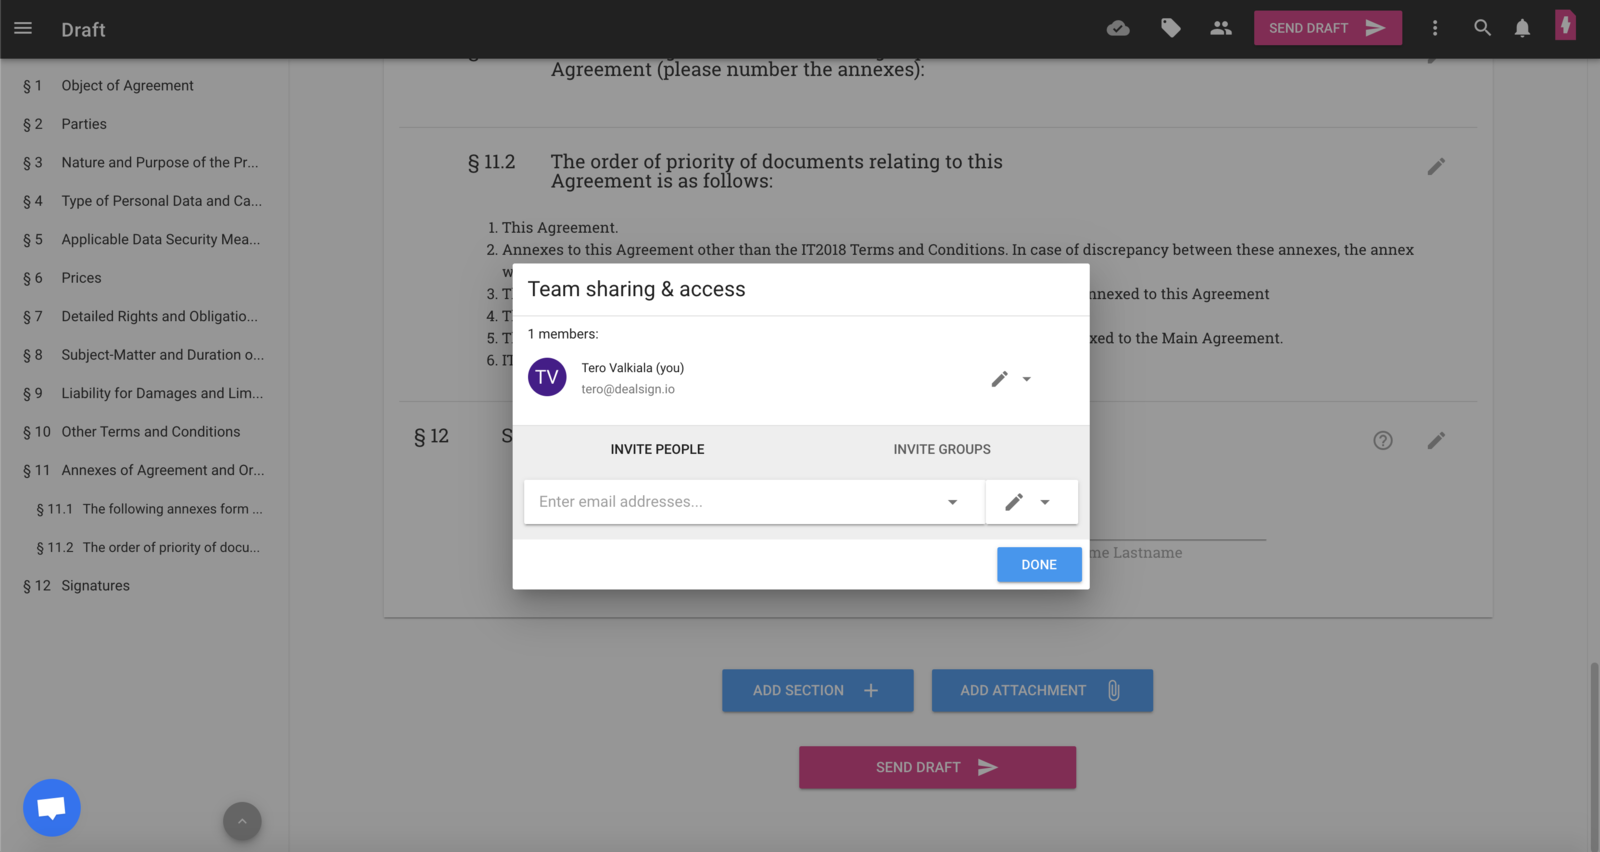 Team sharing & access